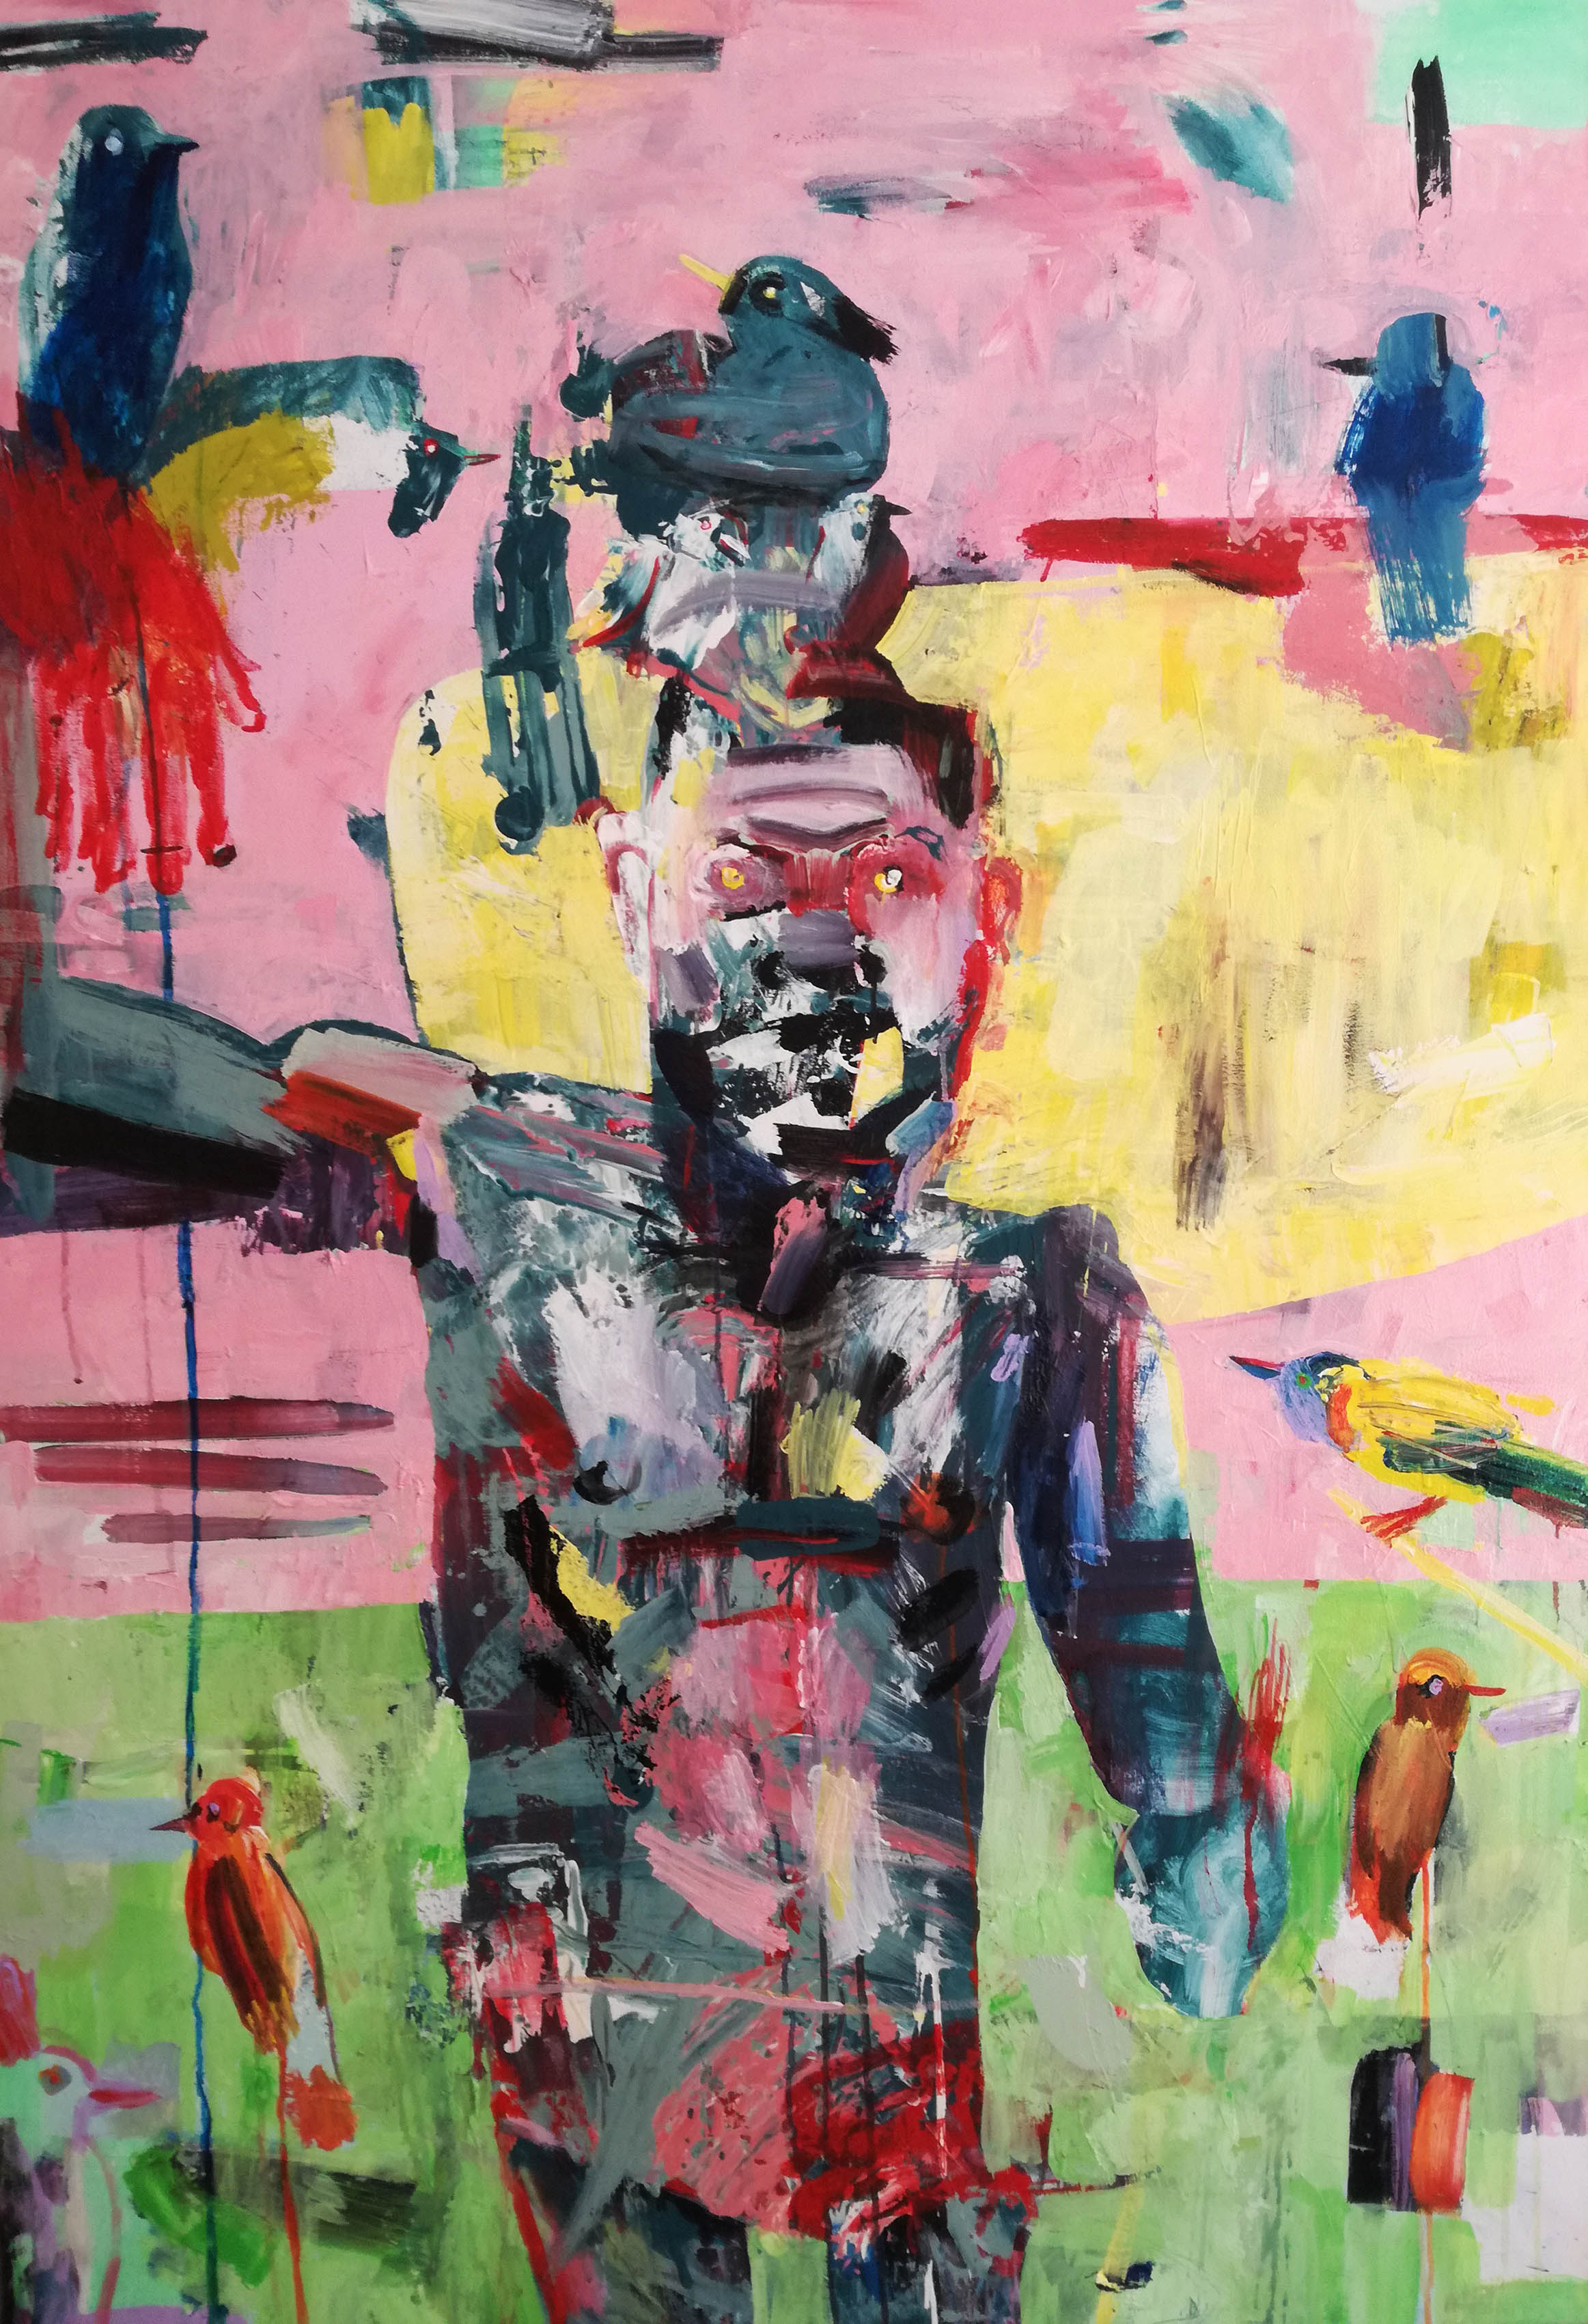 ' Birdcatcher' , Su Opperman, Mixed media on canvas, 1540 x 1060 mm, R 18 000.00